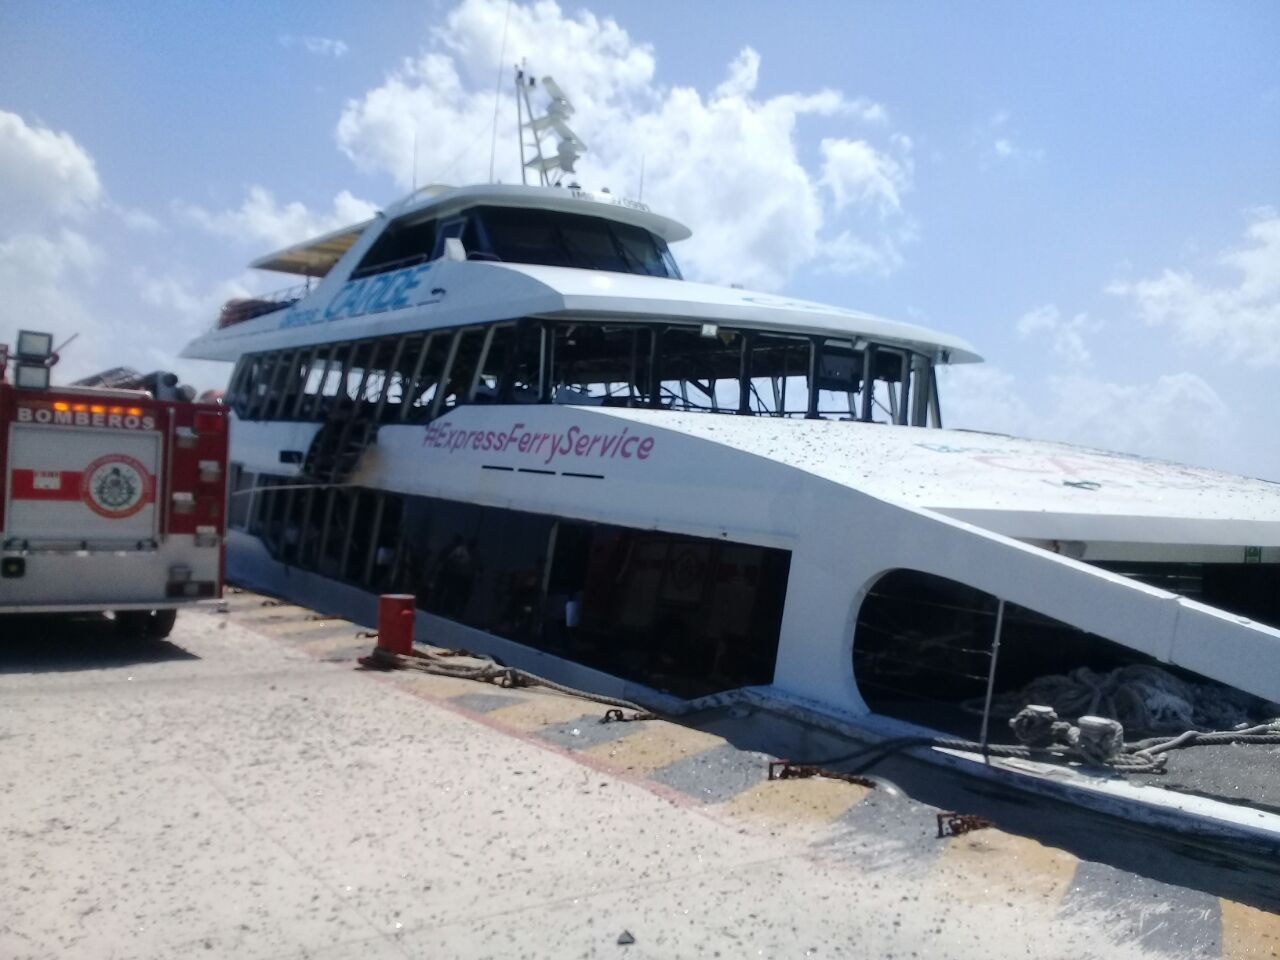 <i>Aumenta</i> cifra de heridos por explosión en Barcos Caribe